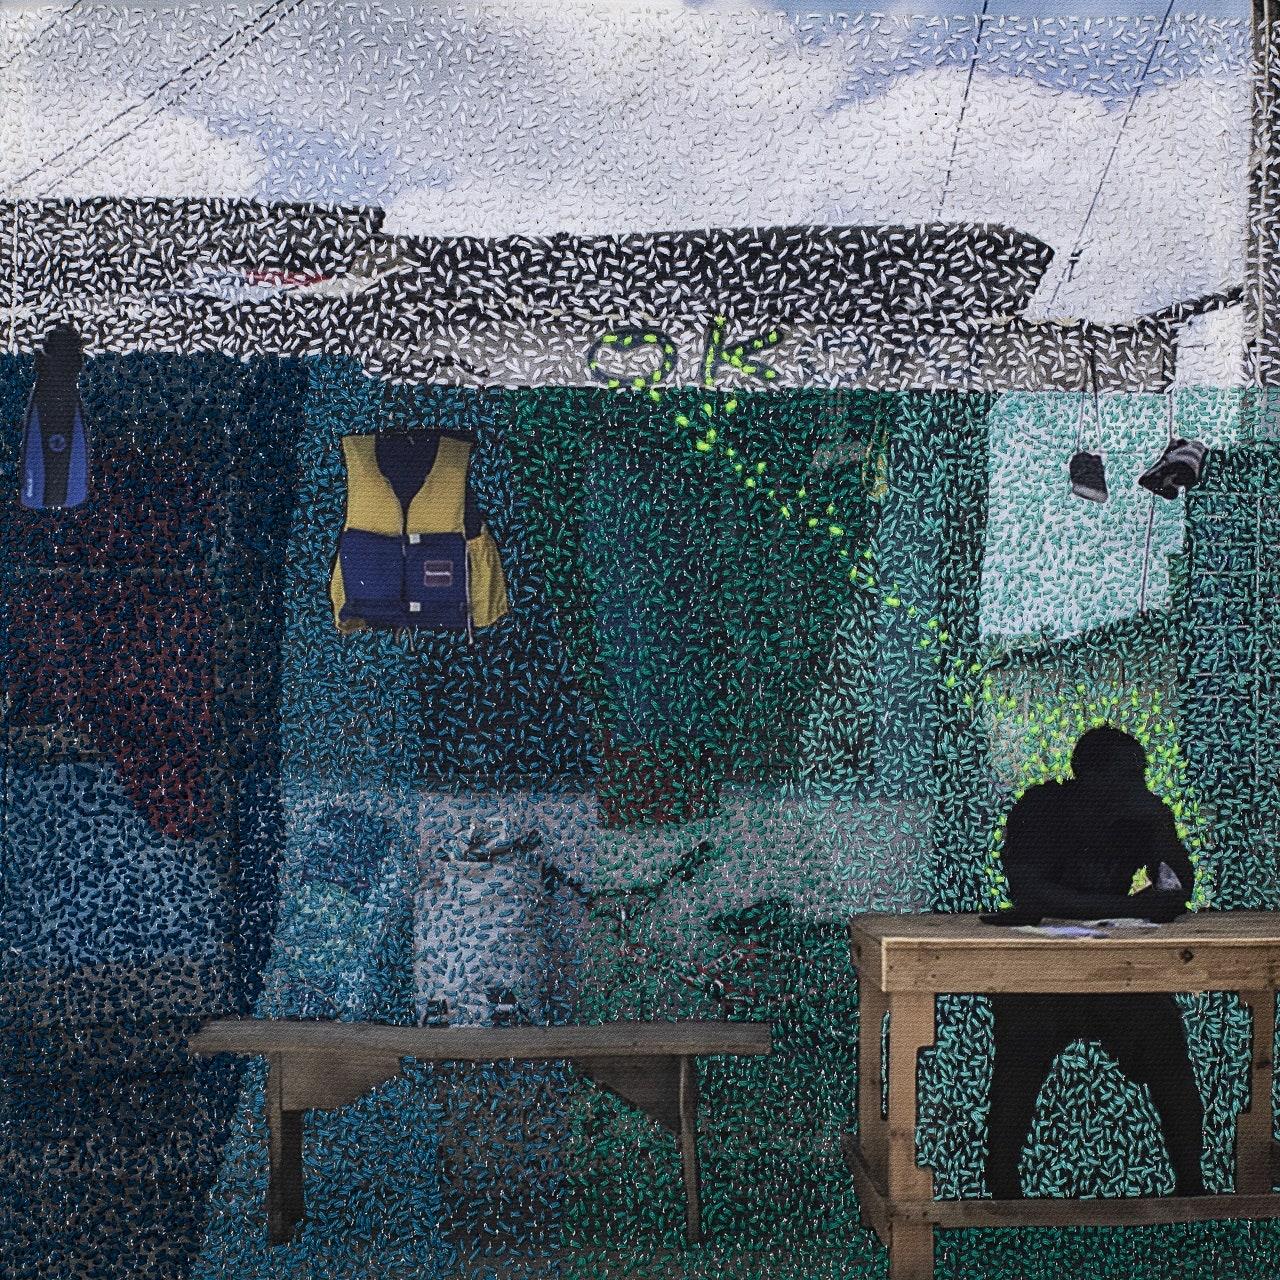 .  . 2019.   a va aller 20162019.  Joana Choumali Prix Pictet